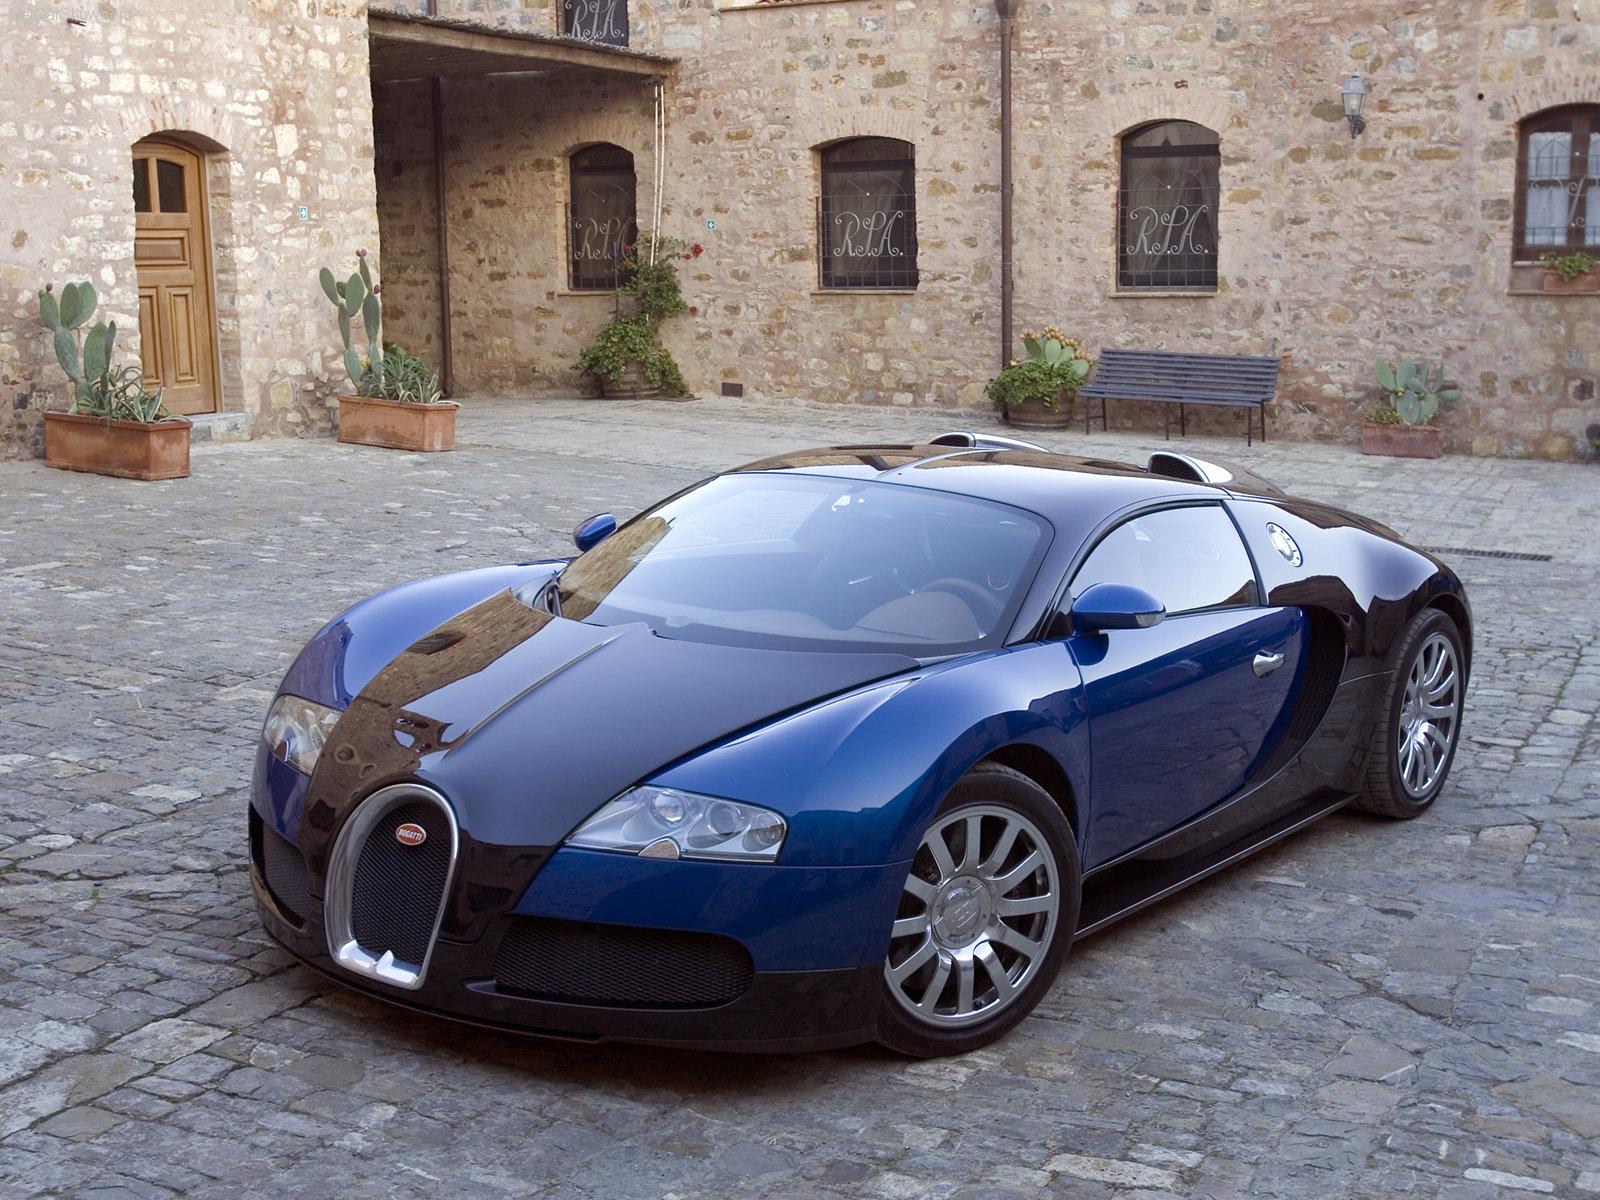 Cool Car Wallpapers: bugatti veyron wallpaper